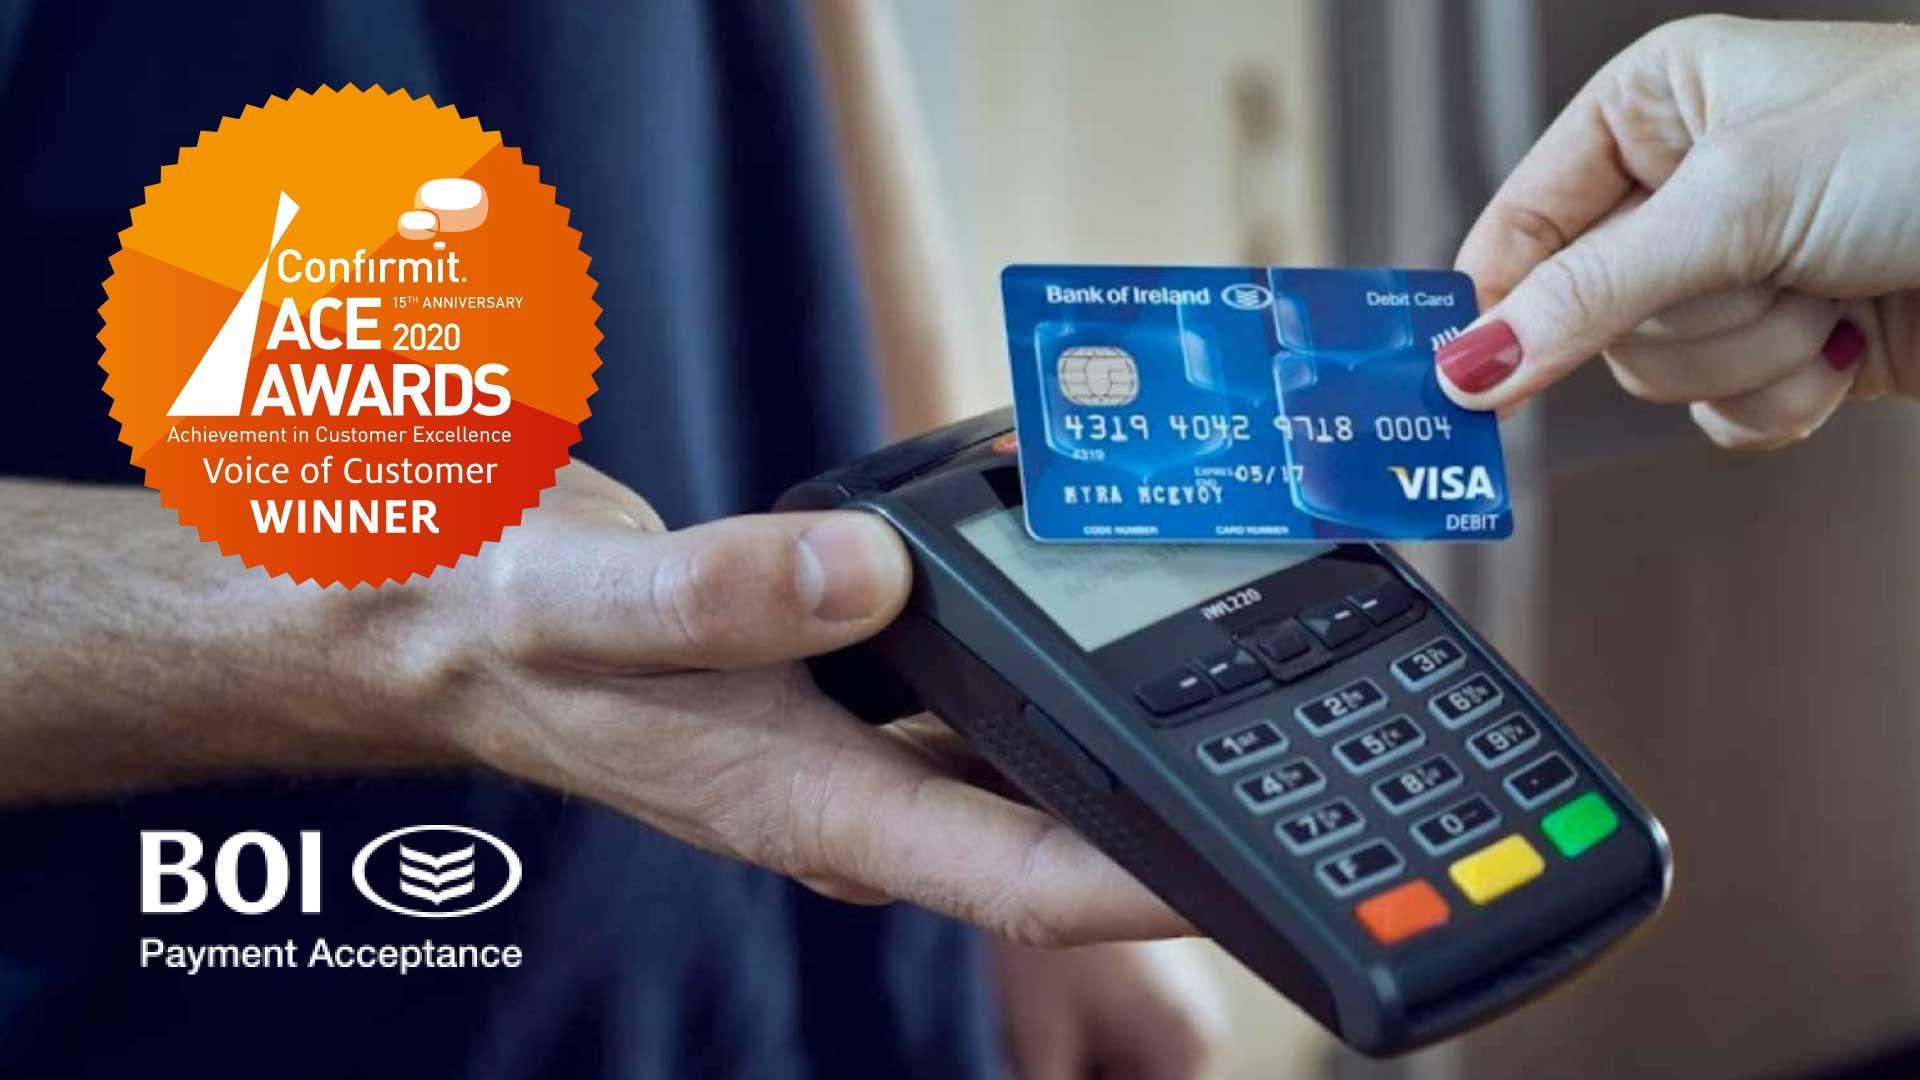 BOI-payment-award-article-1a